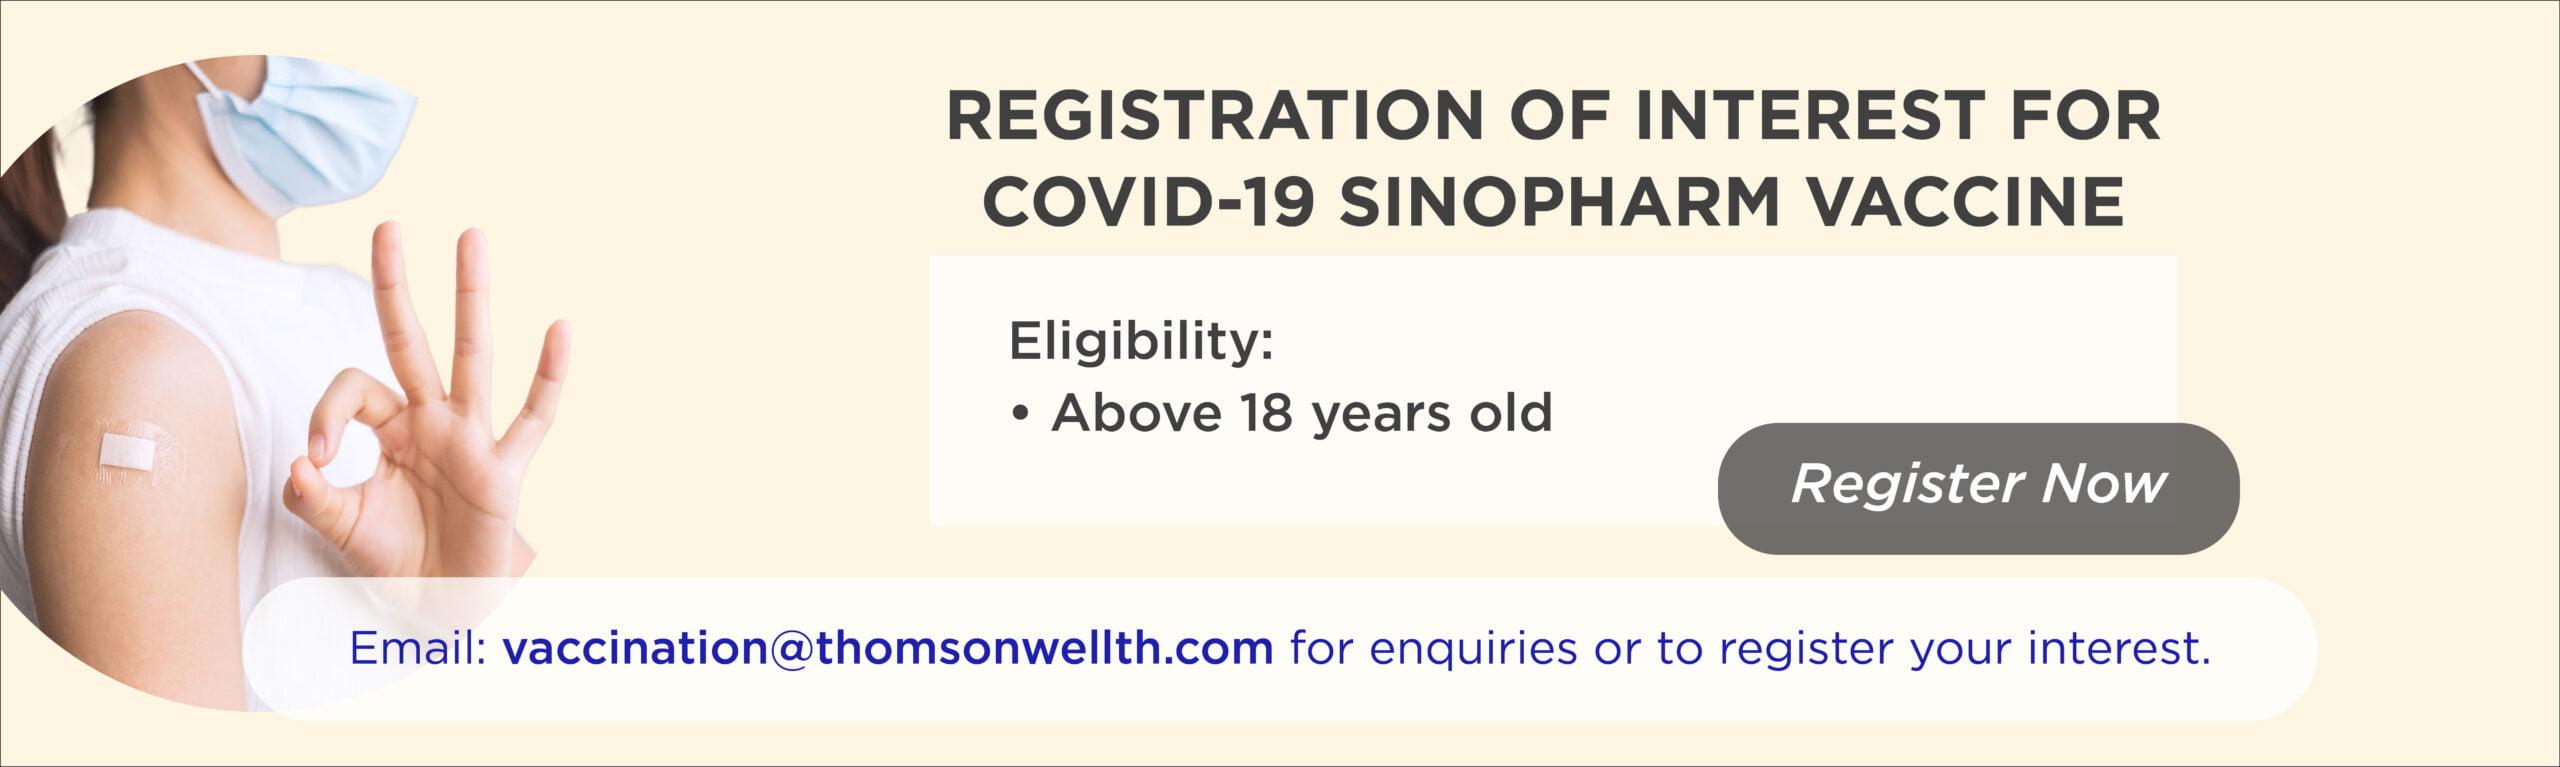 COVID-19 Sinopharm Vaccine 1